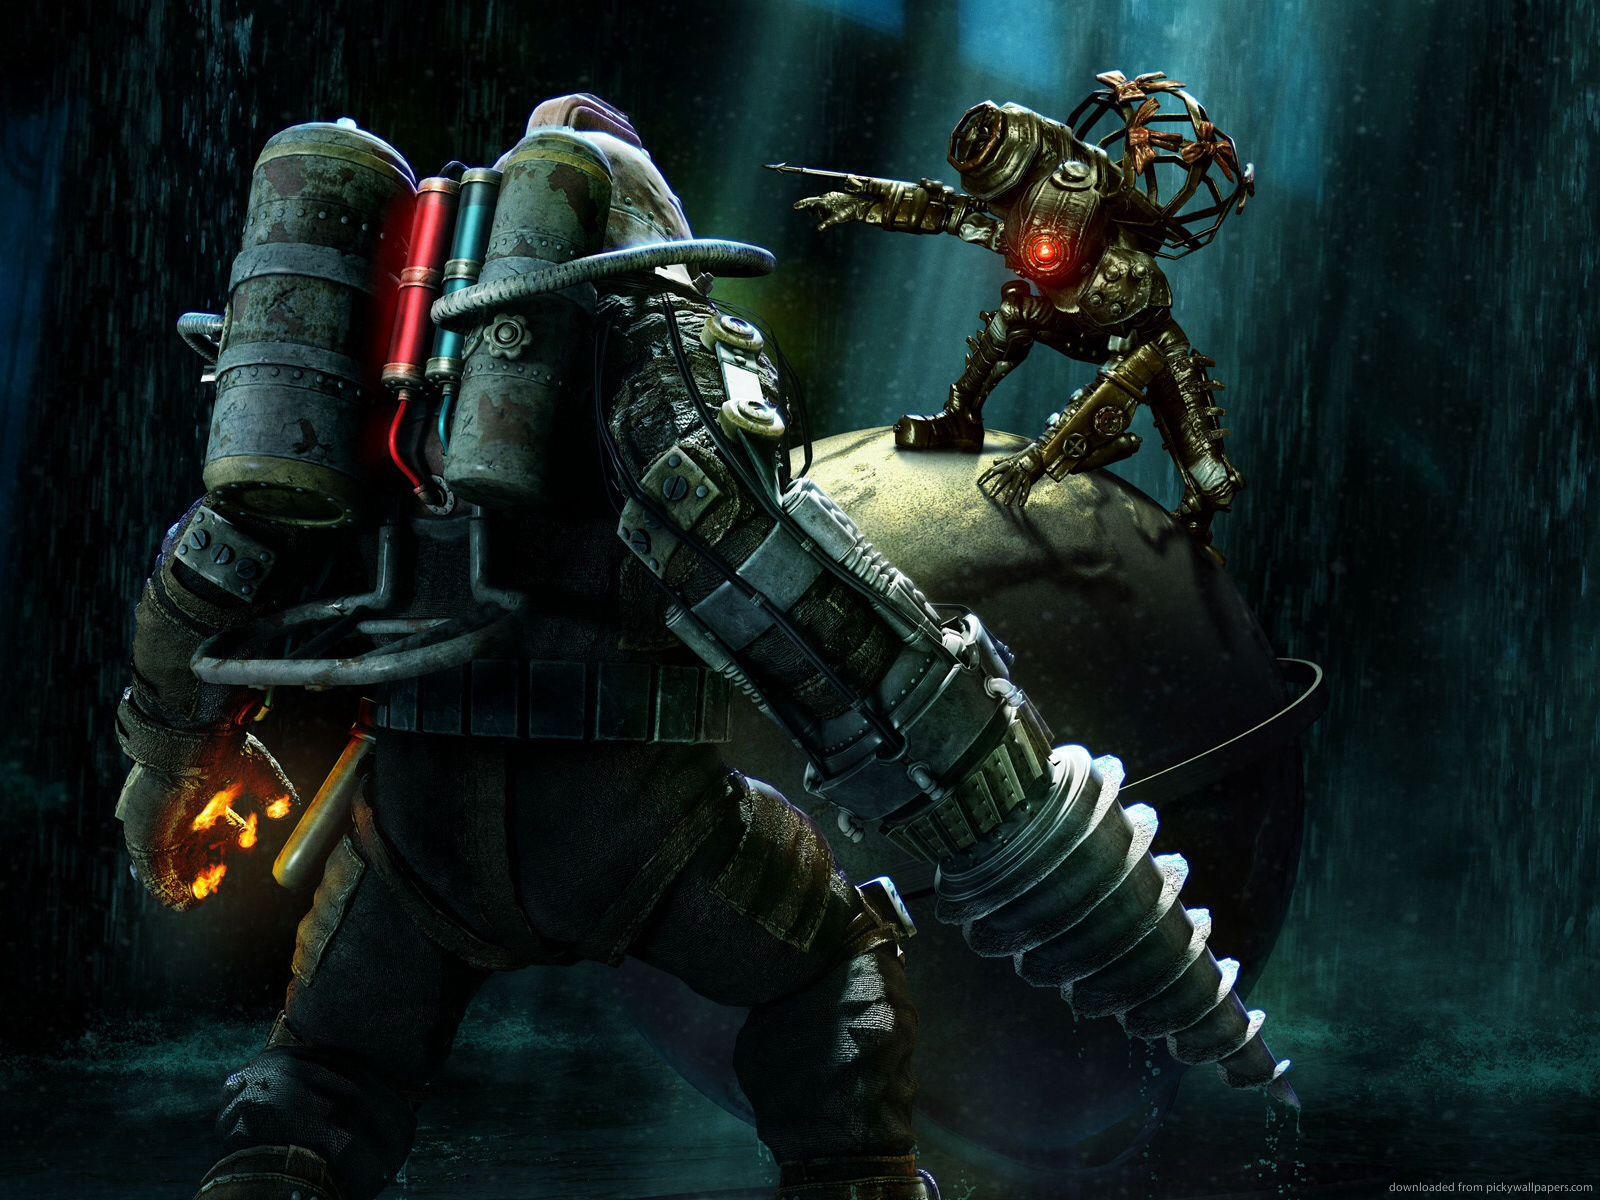 Big Daddy Vs Big Sister Bioshock Bioshock Rapture Bioshock Game